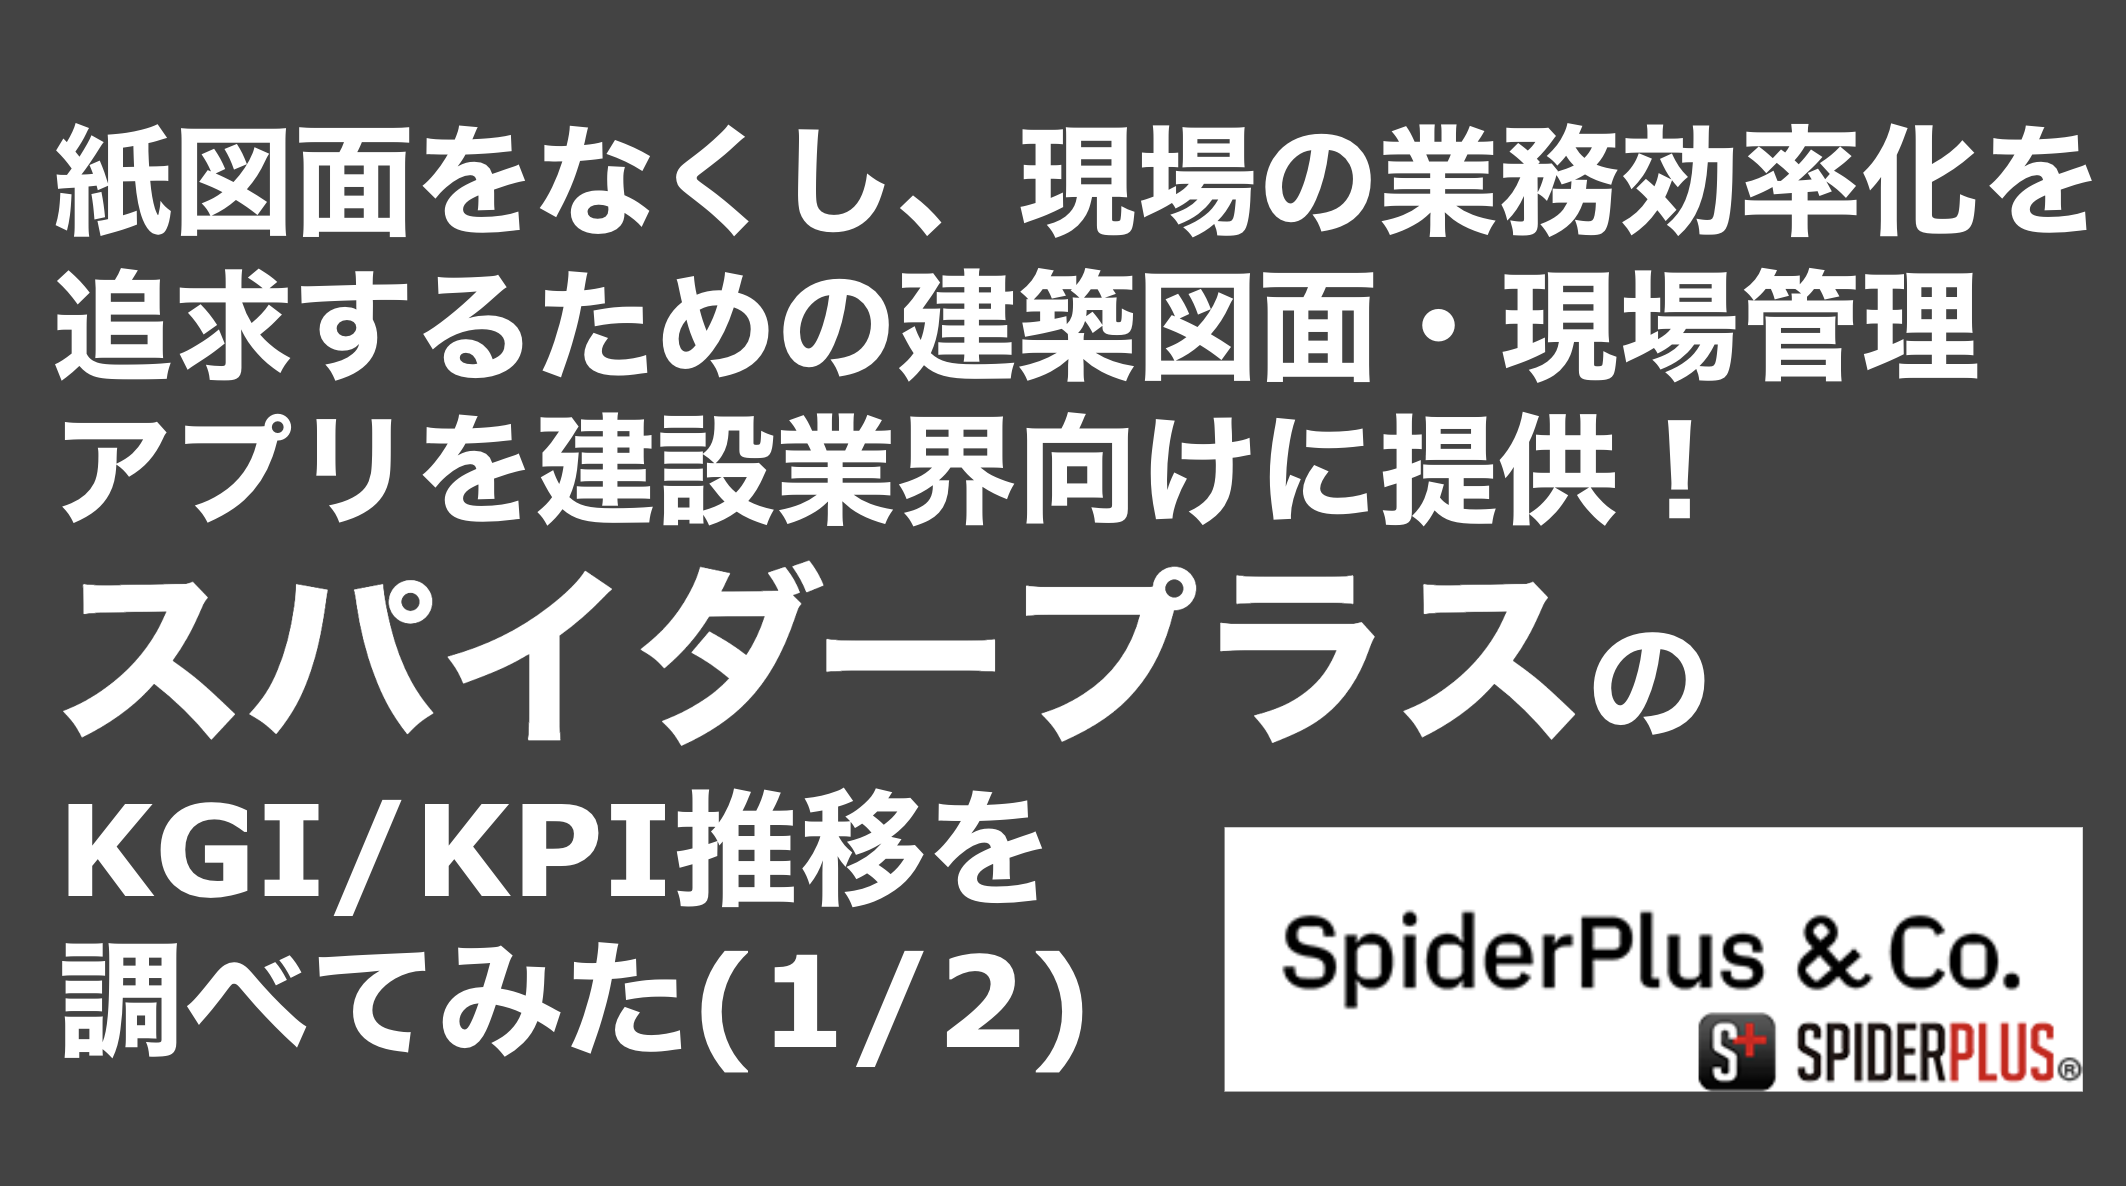 saaslife_紙図面をなくし、現場の業務効率化を追求するための建築図面・現場管理アプリを建設業界向けに提供!スパイダープラスのKGI/KPI推移を調べてみた(1/2)